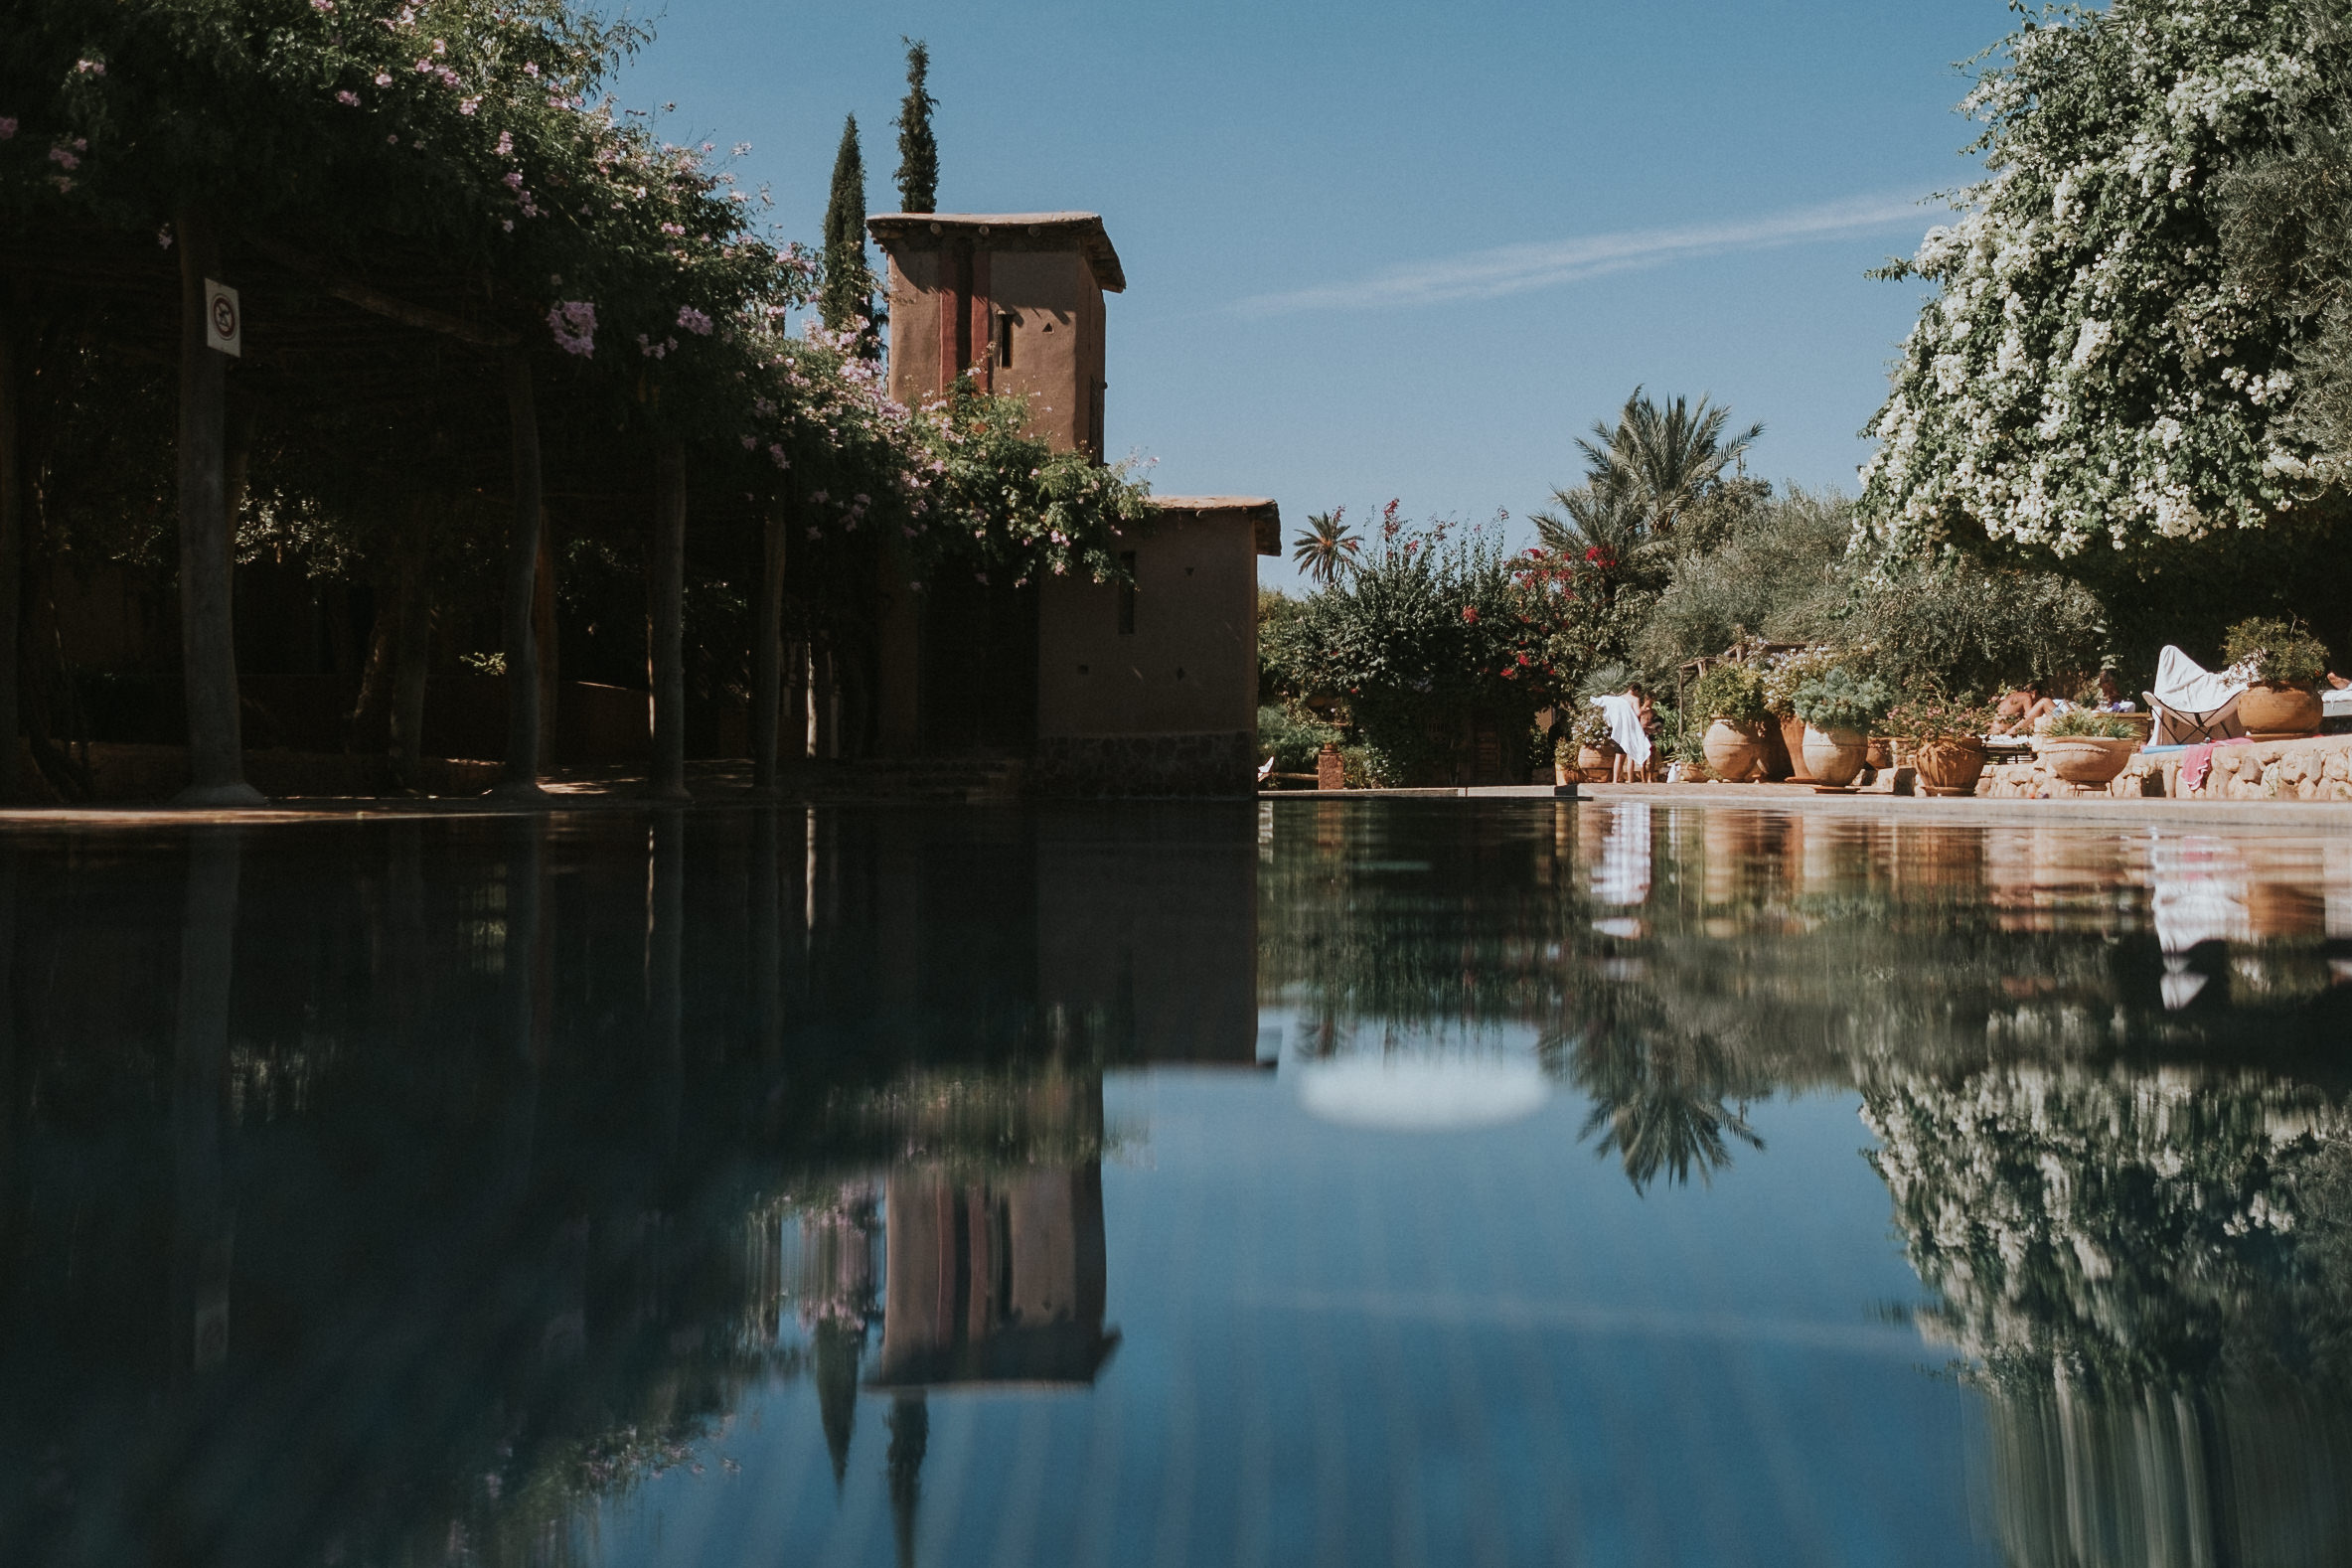 craig_nicholas_photography_beldi_morocco (1 of 1)-2.jpg